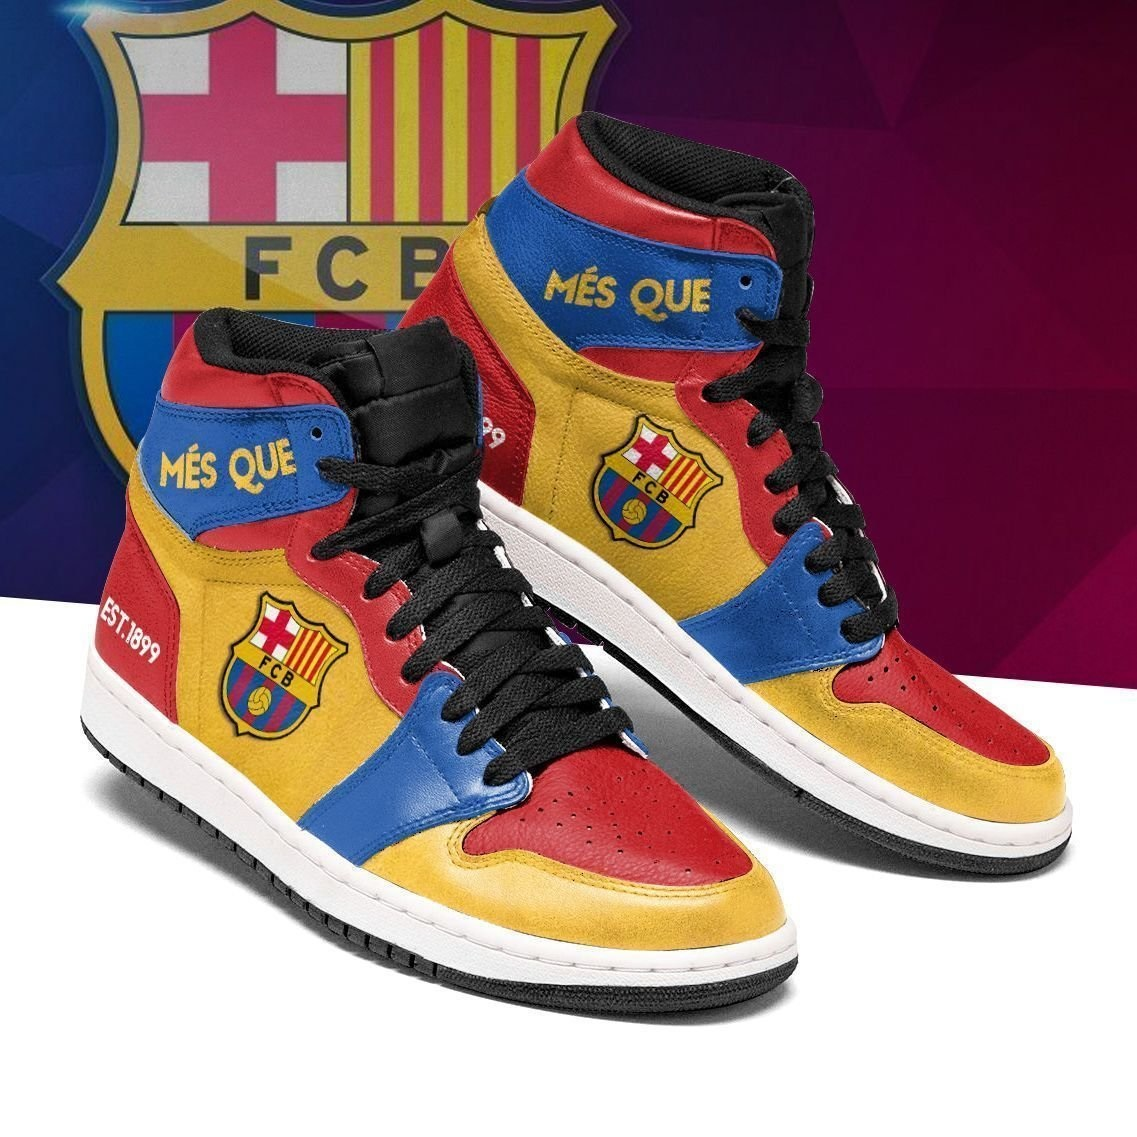 Barcelona jordan sneakers shoes